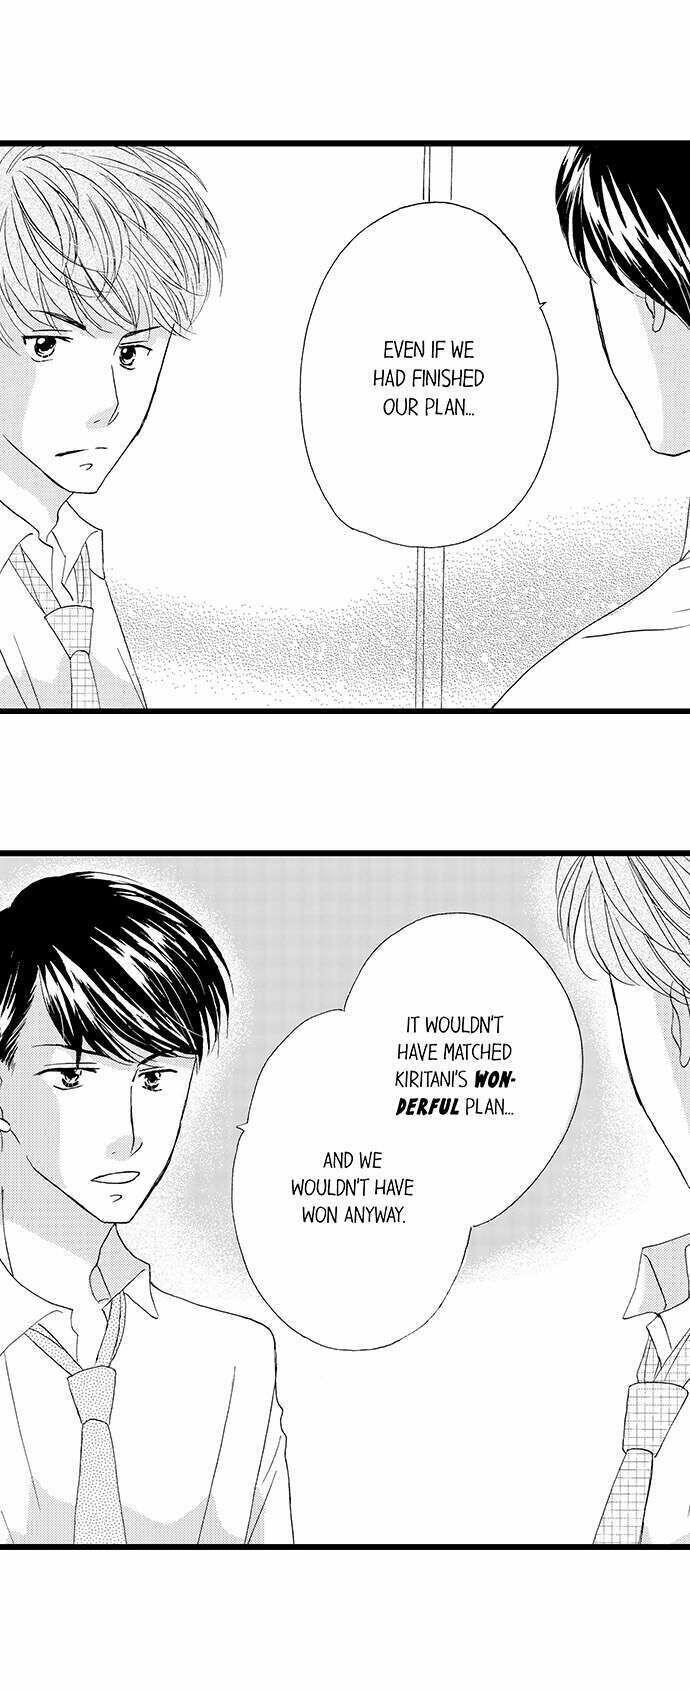 Amaku Nureru Uso Kekkon Toiu Na No Fukushu Chapter 64 page 9 - Mangakakalots.com